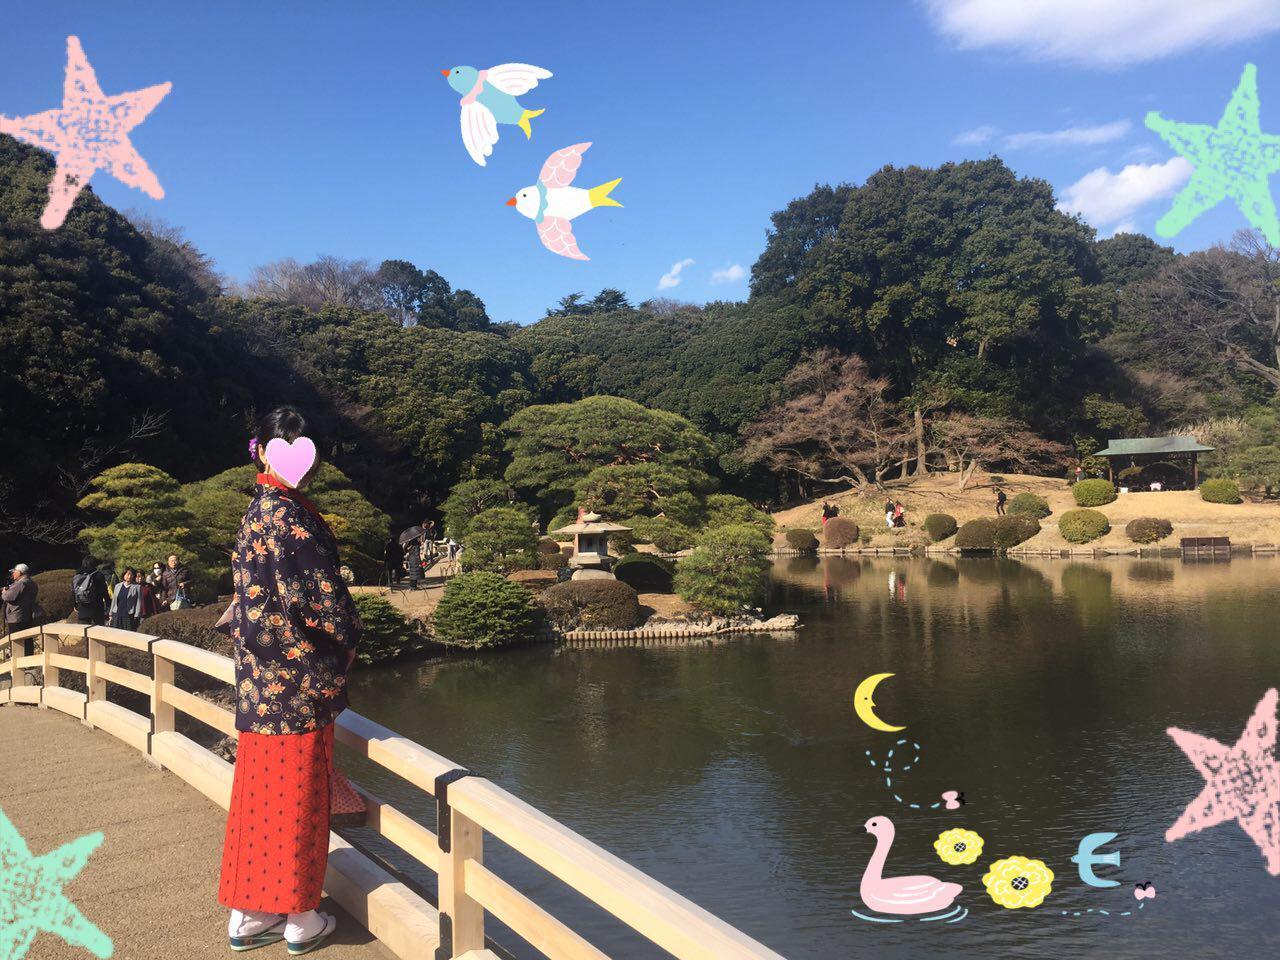 photo_2017-03-11_22-36-35.jpg